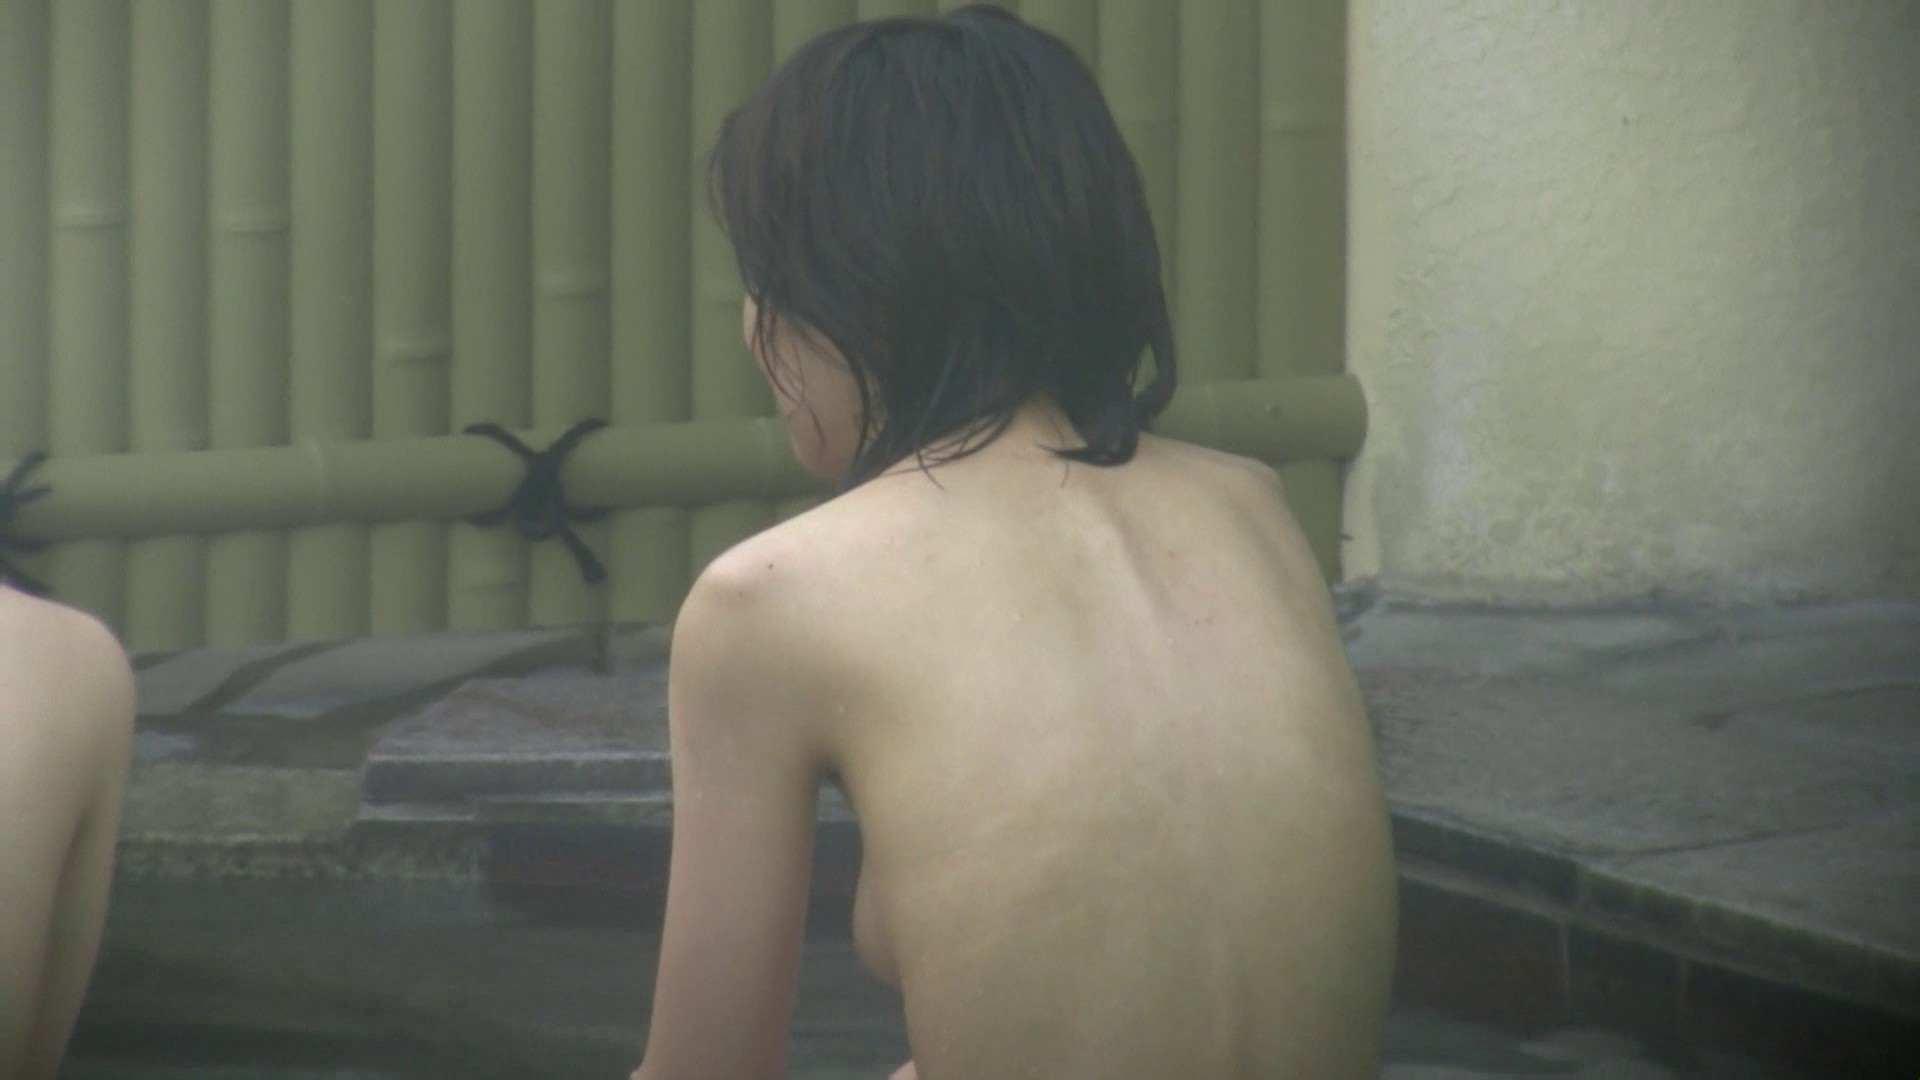 Aquaな露天風呂Vol.583 露天風呂突入 | 盗撮師作品  103pic 97